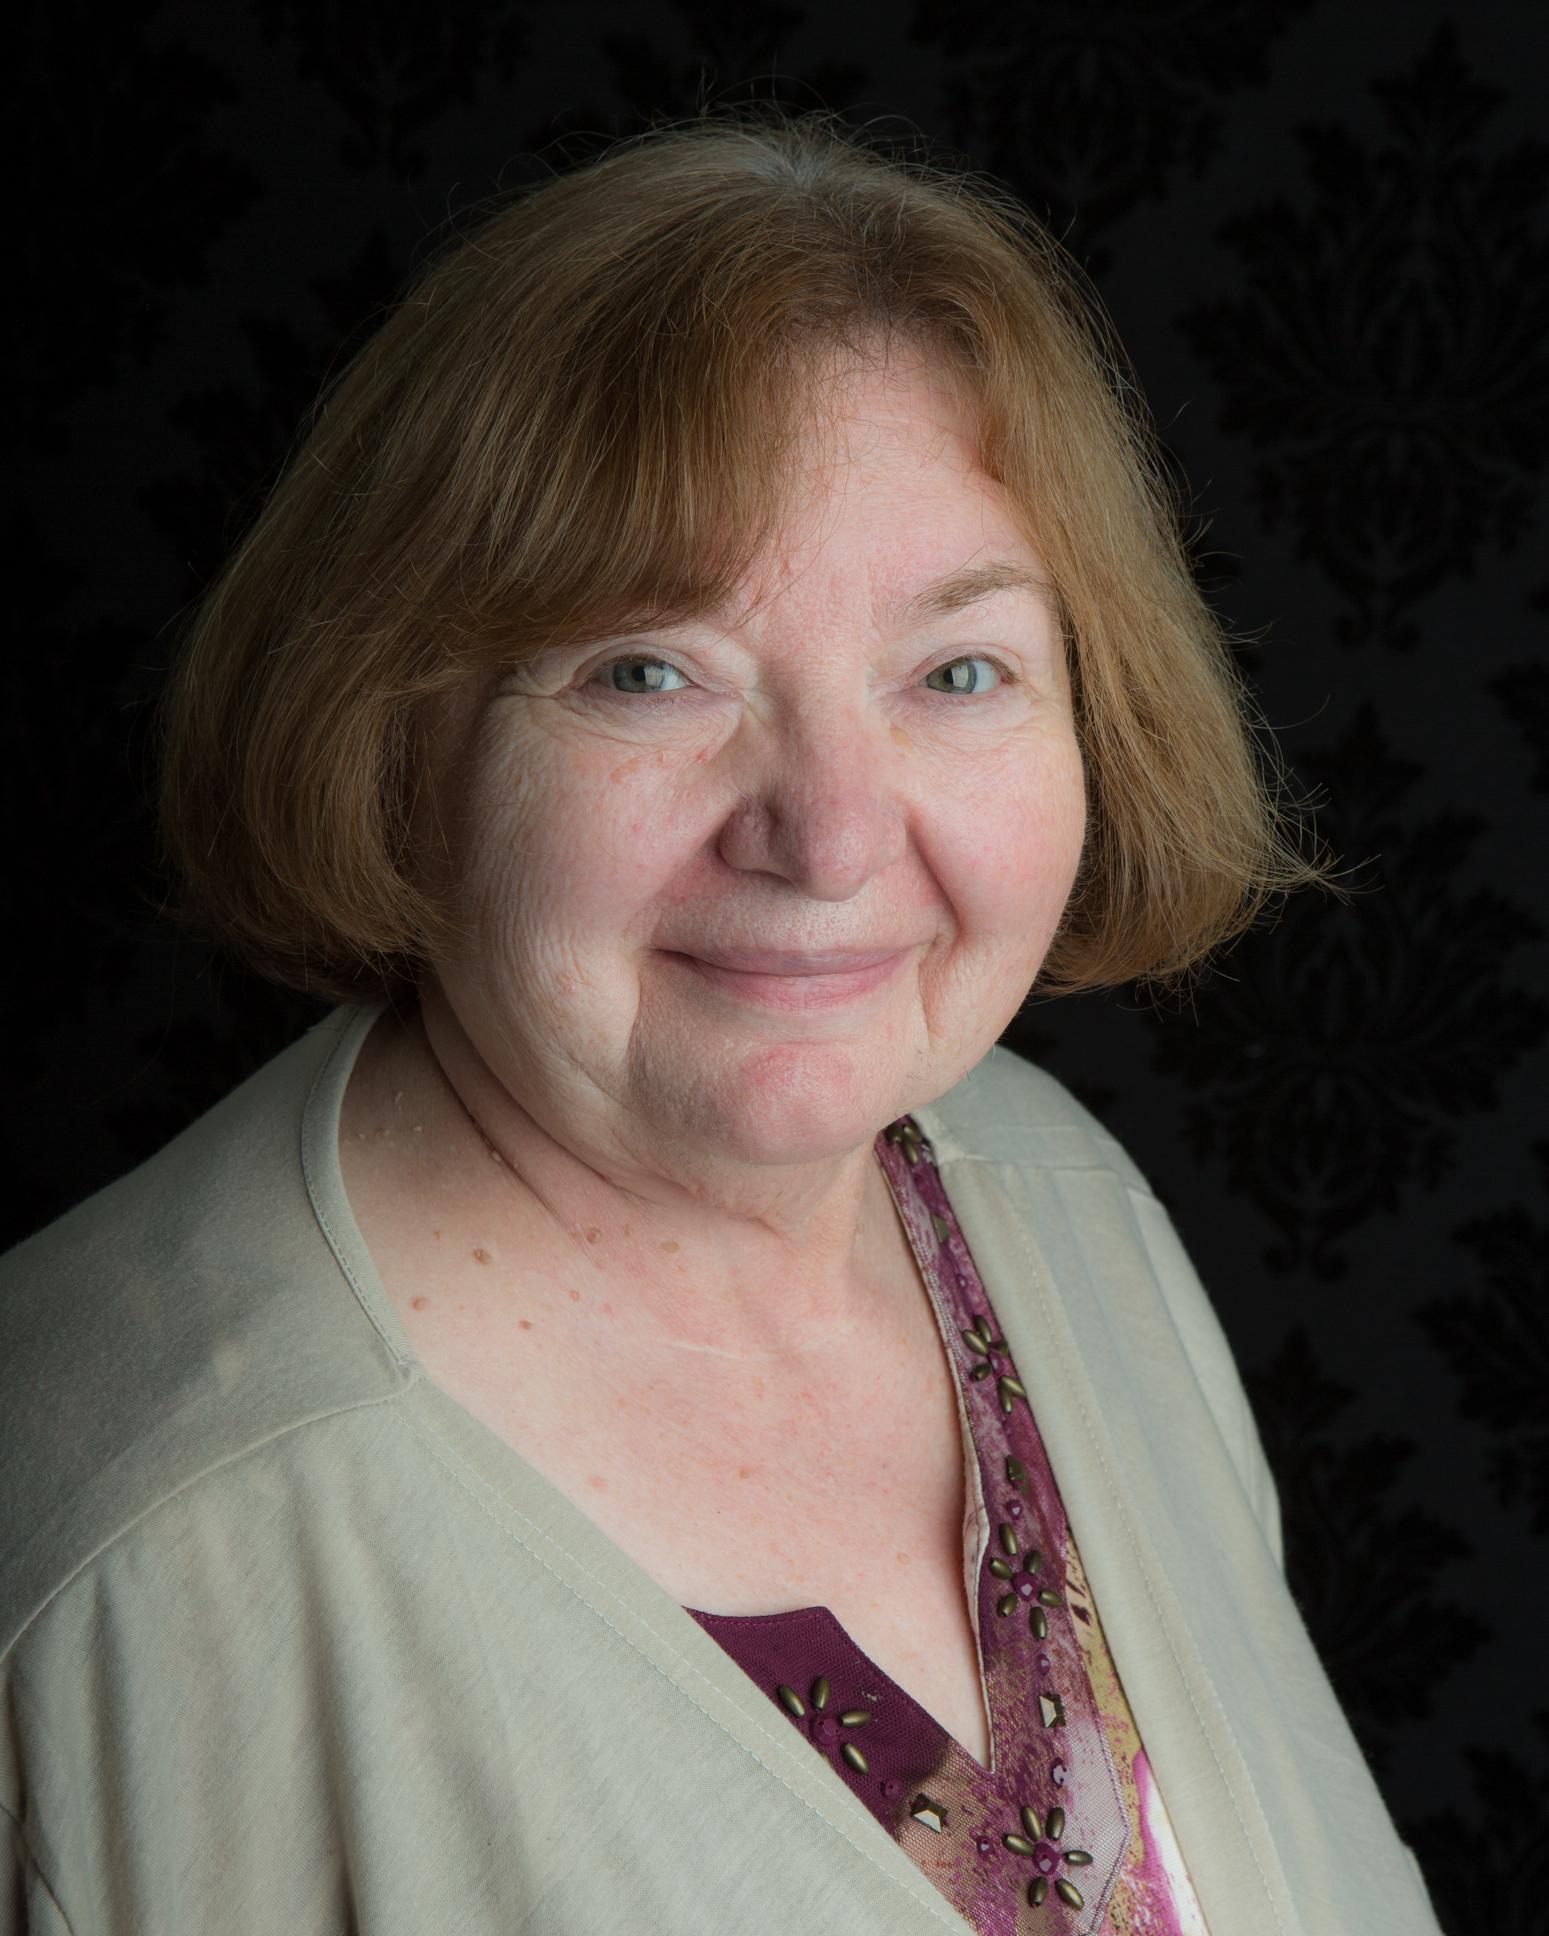 Author Verity Moore